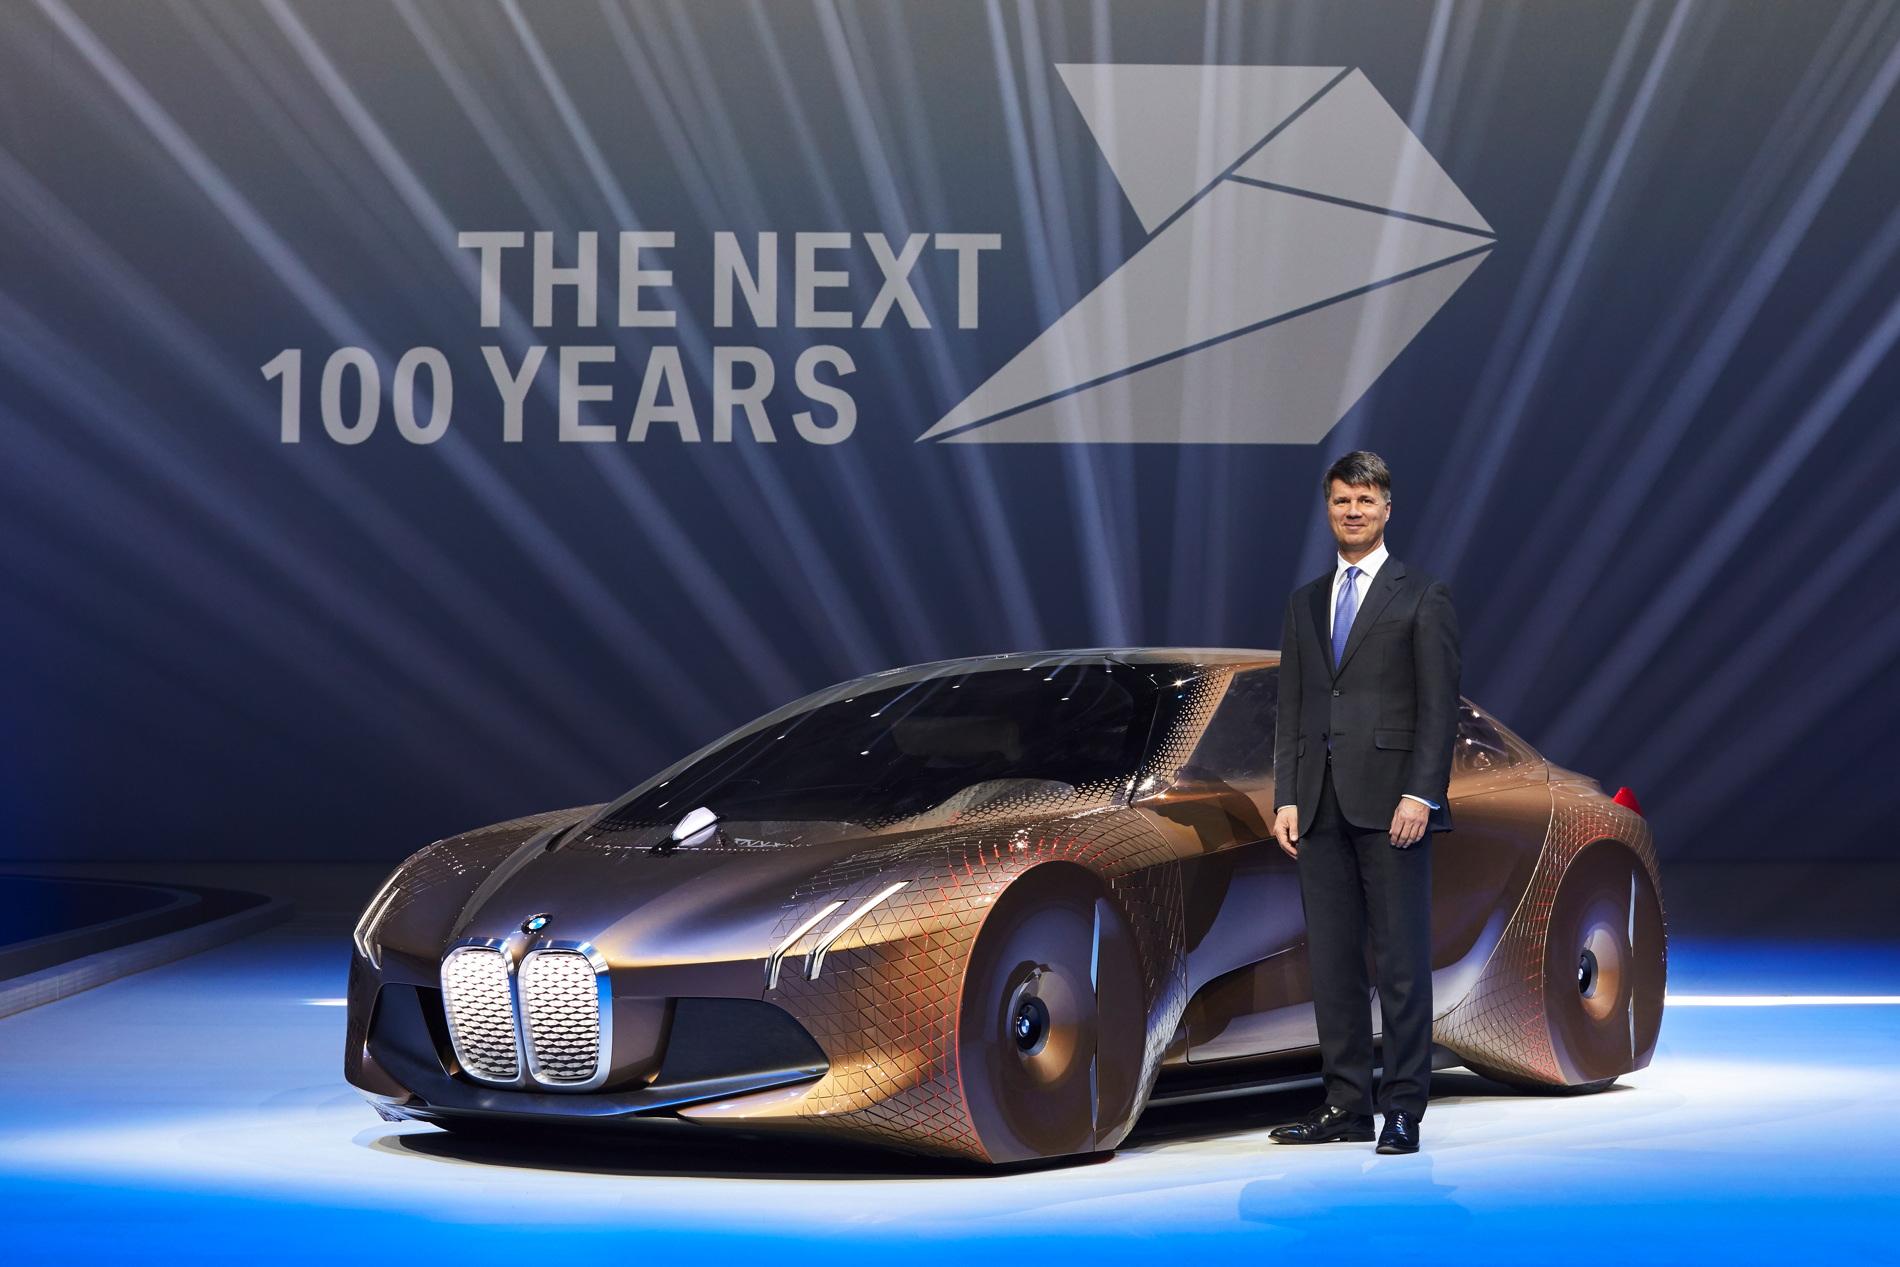 BMW VISION NEXT 100 images 34 1